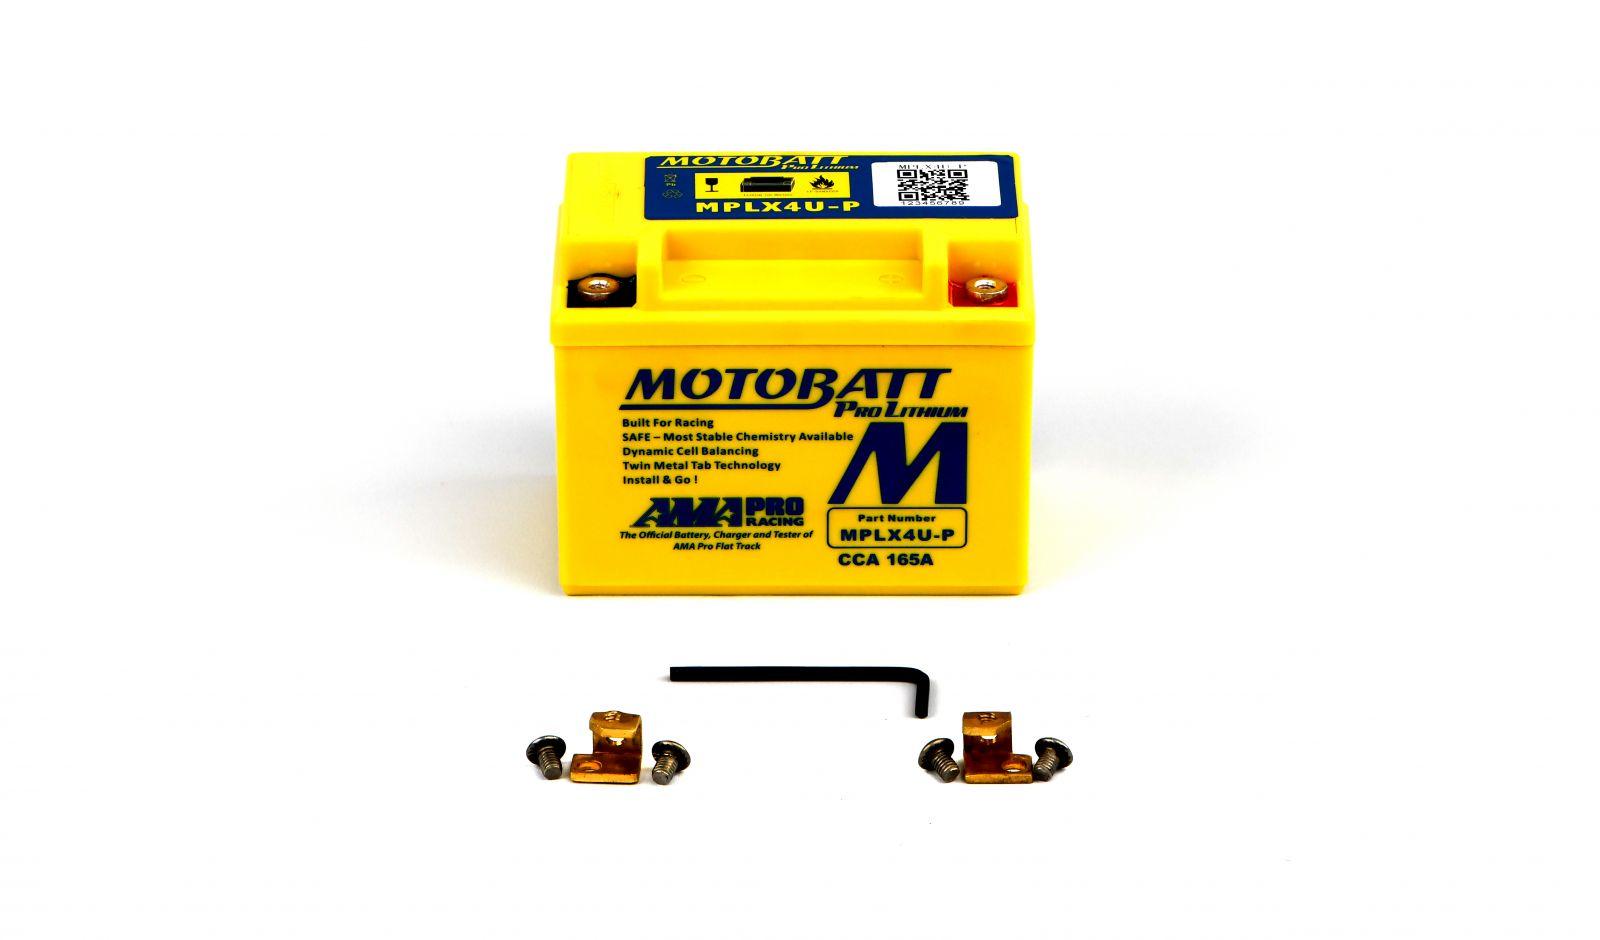 Motobatt Lithium Batteries - 501045ML image